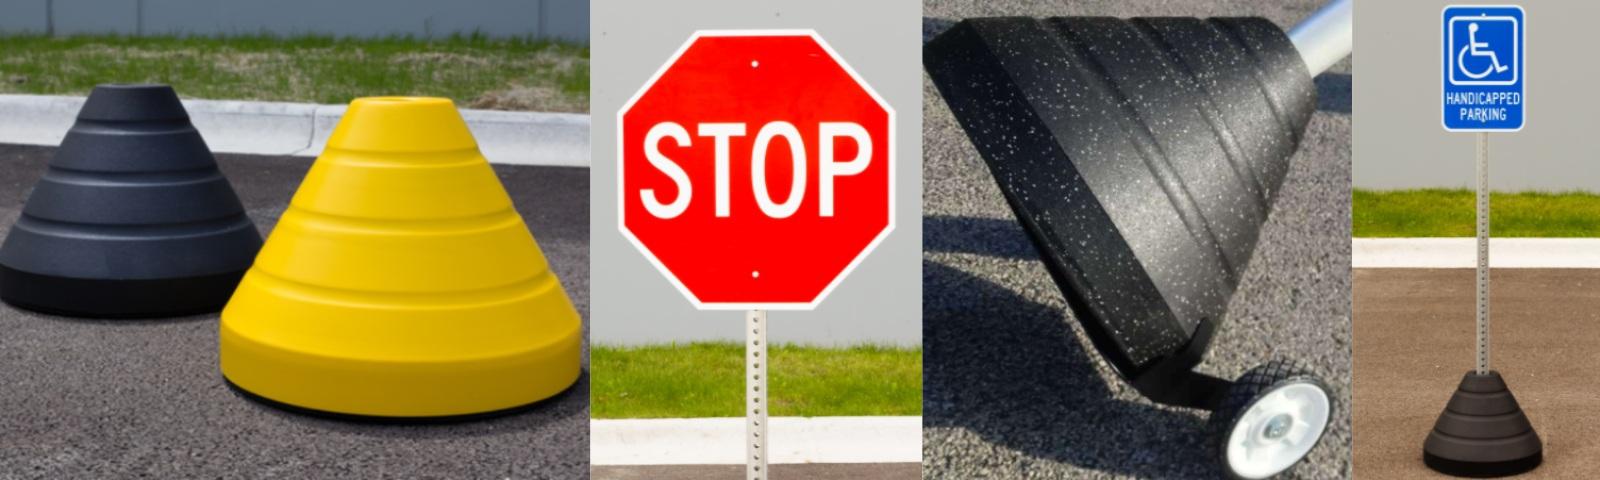 TRAFFIC & PARKING SIGN BASES